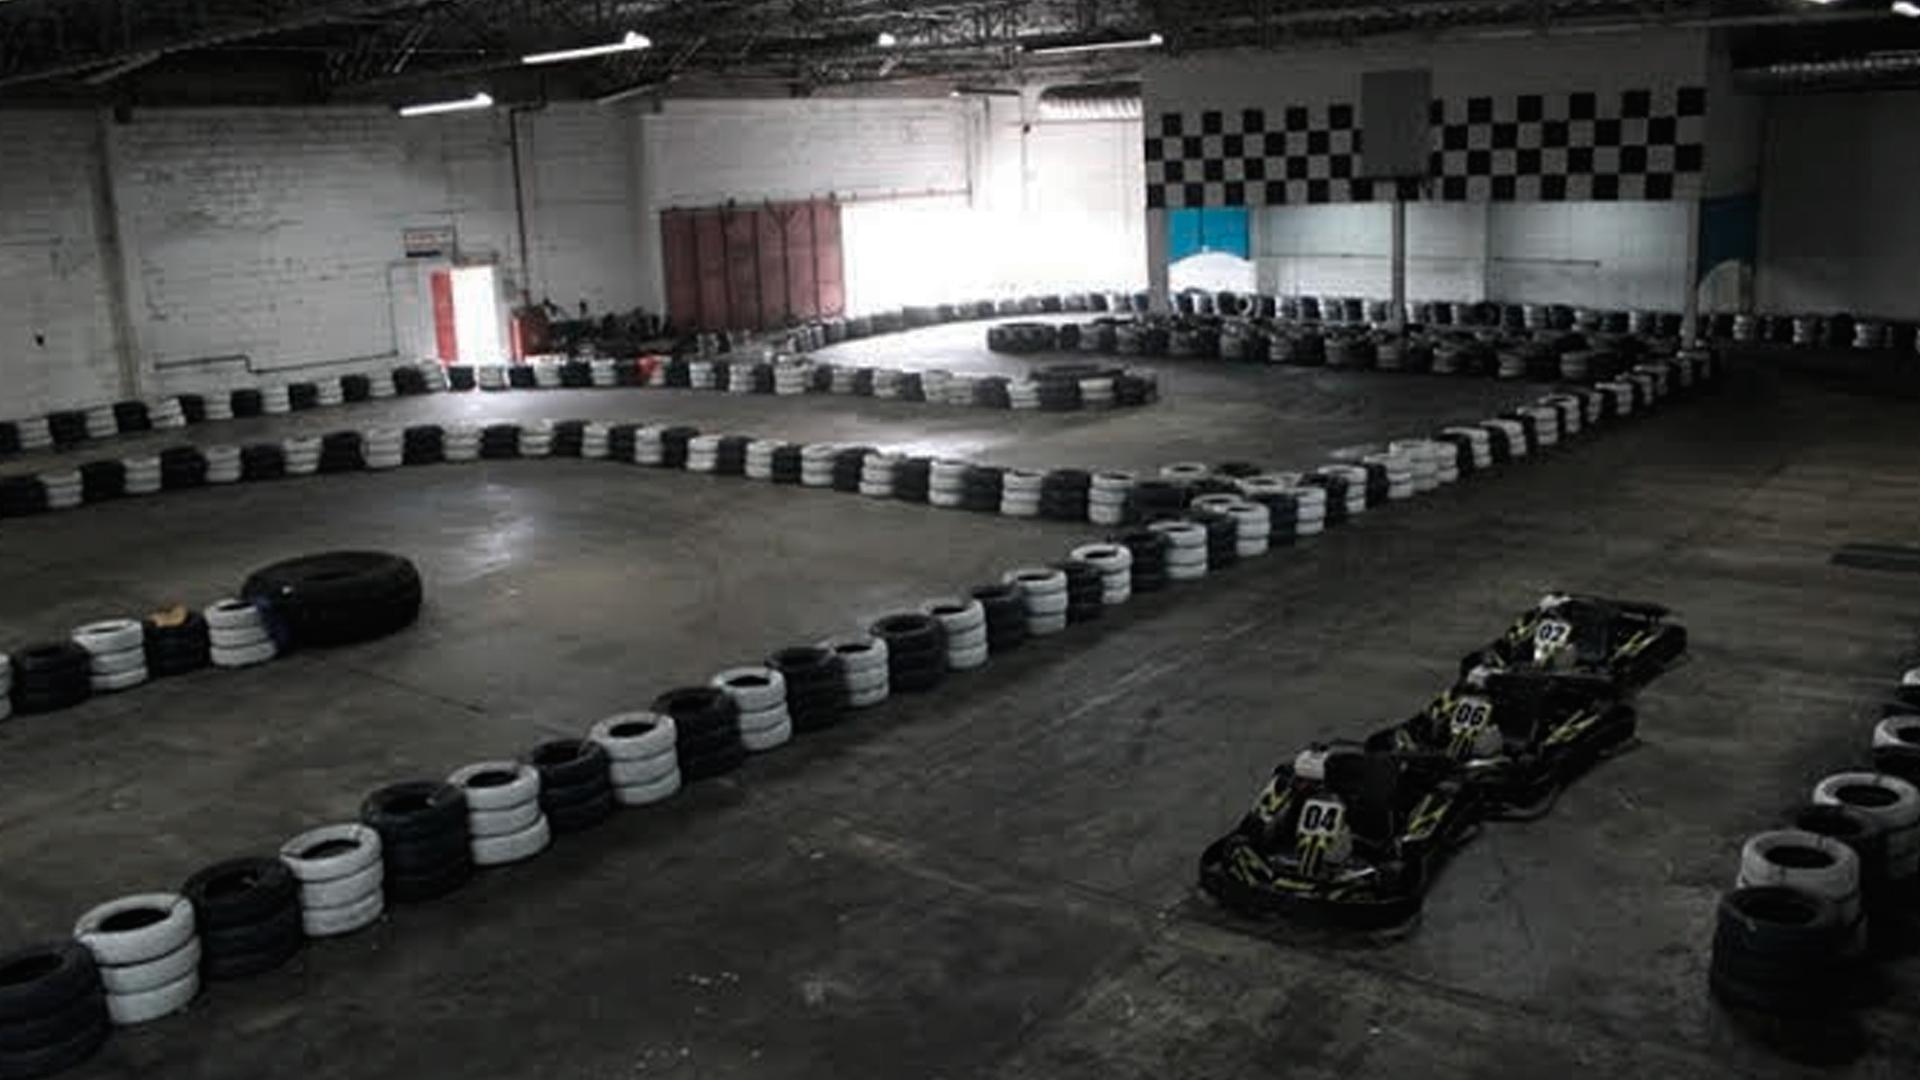 Vista de cima da pista de kart indoor Marumby, que fica no mercado Carrefour